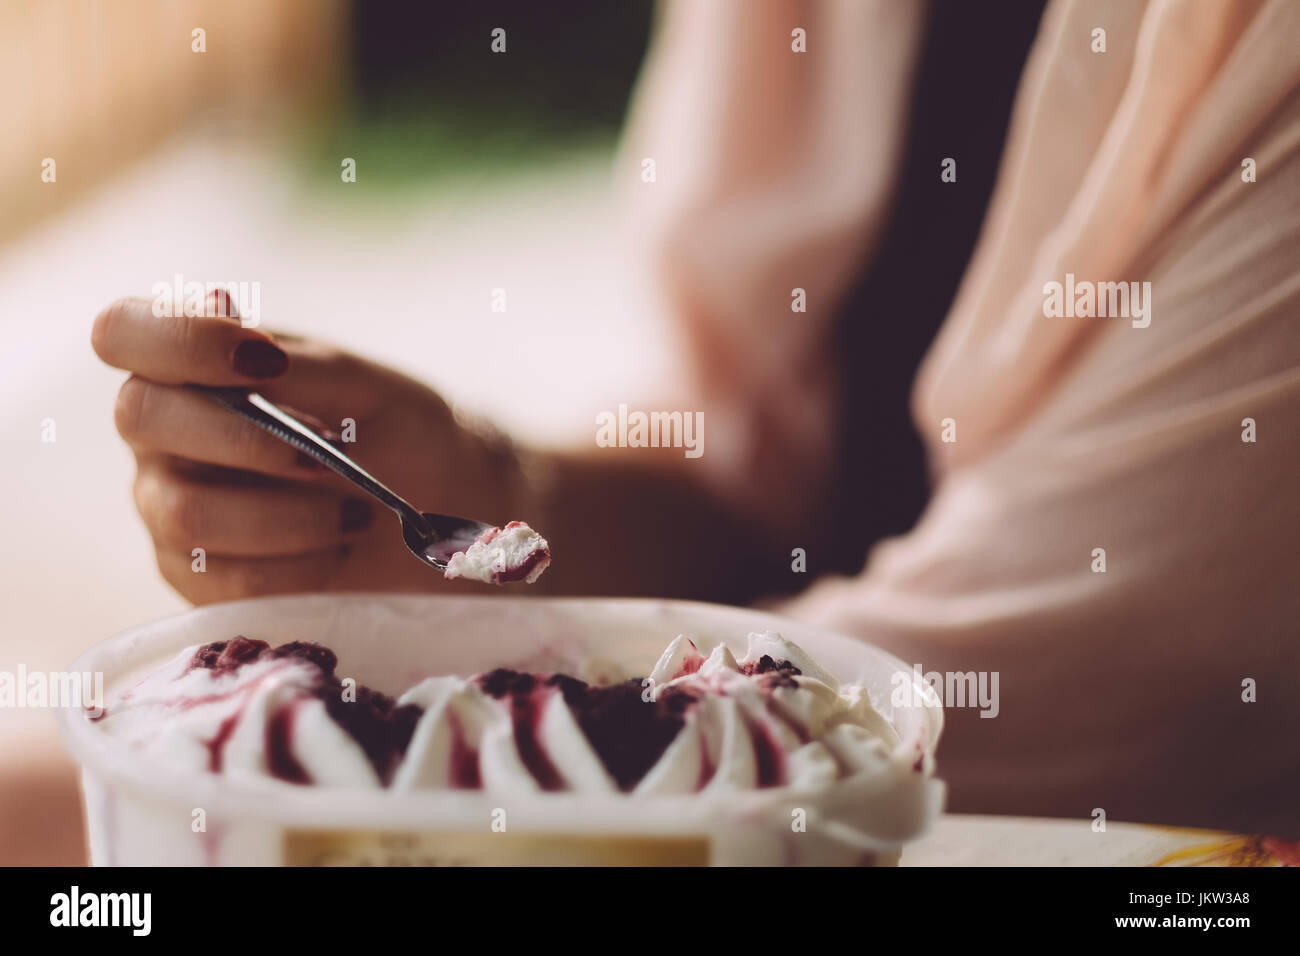 Woman eating ice cream Photo Stock